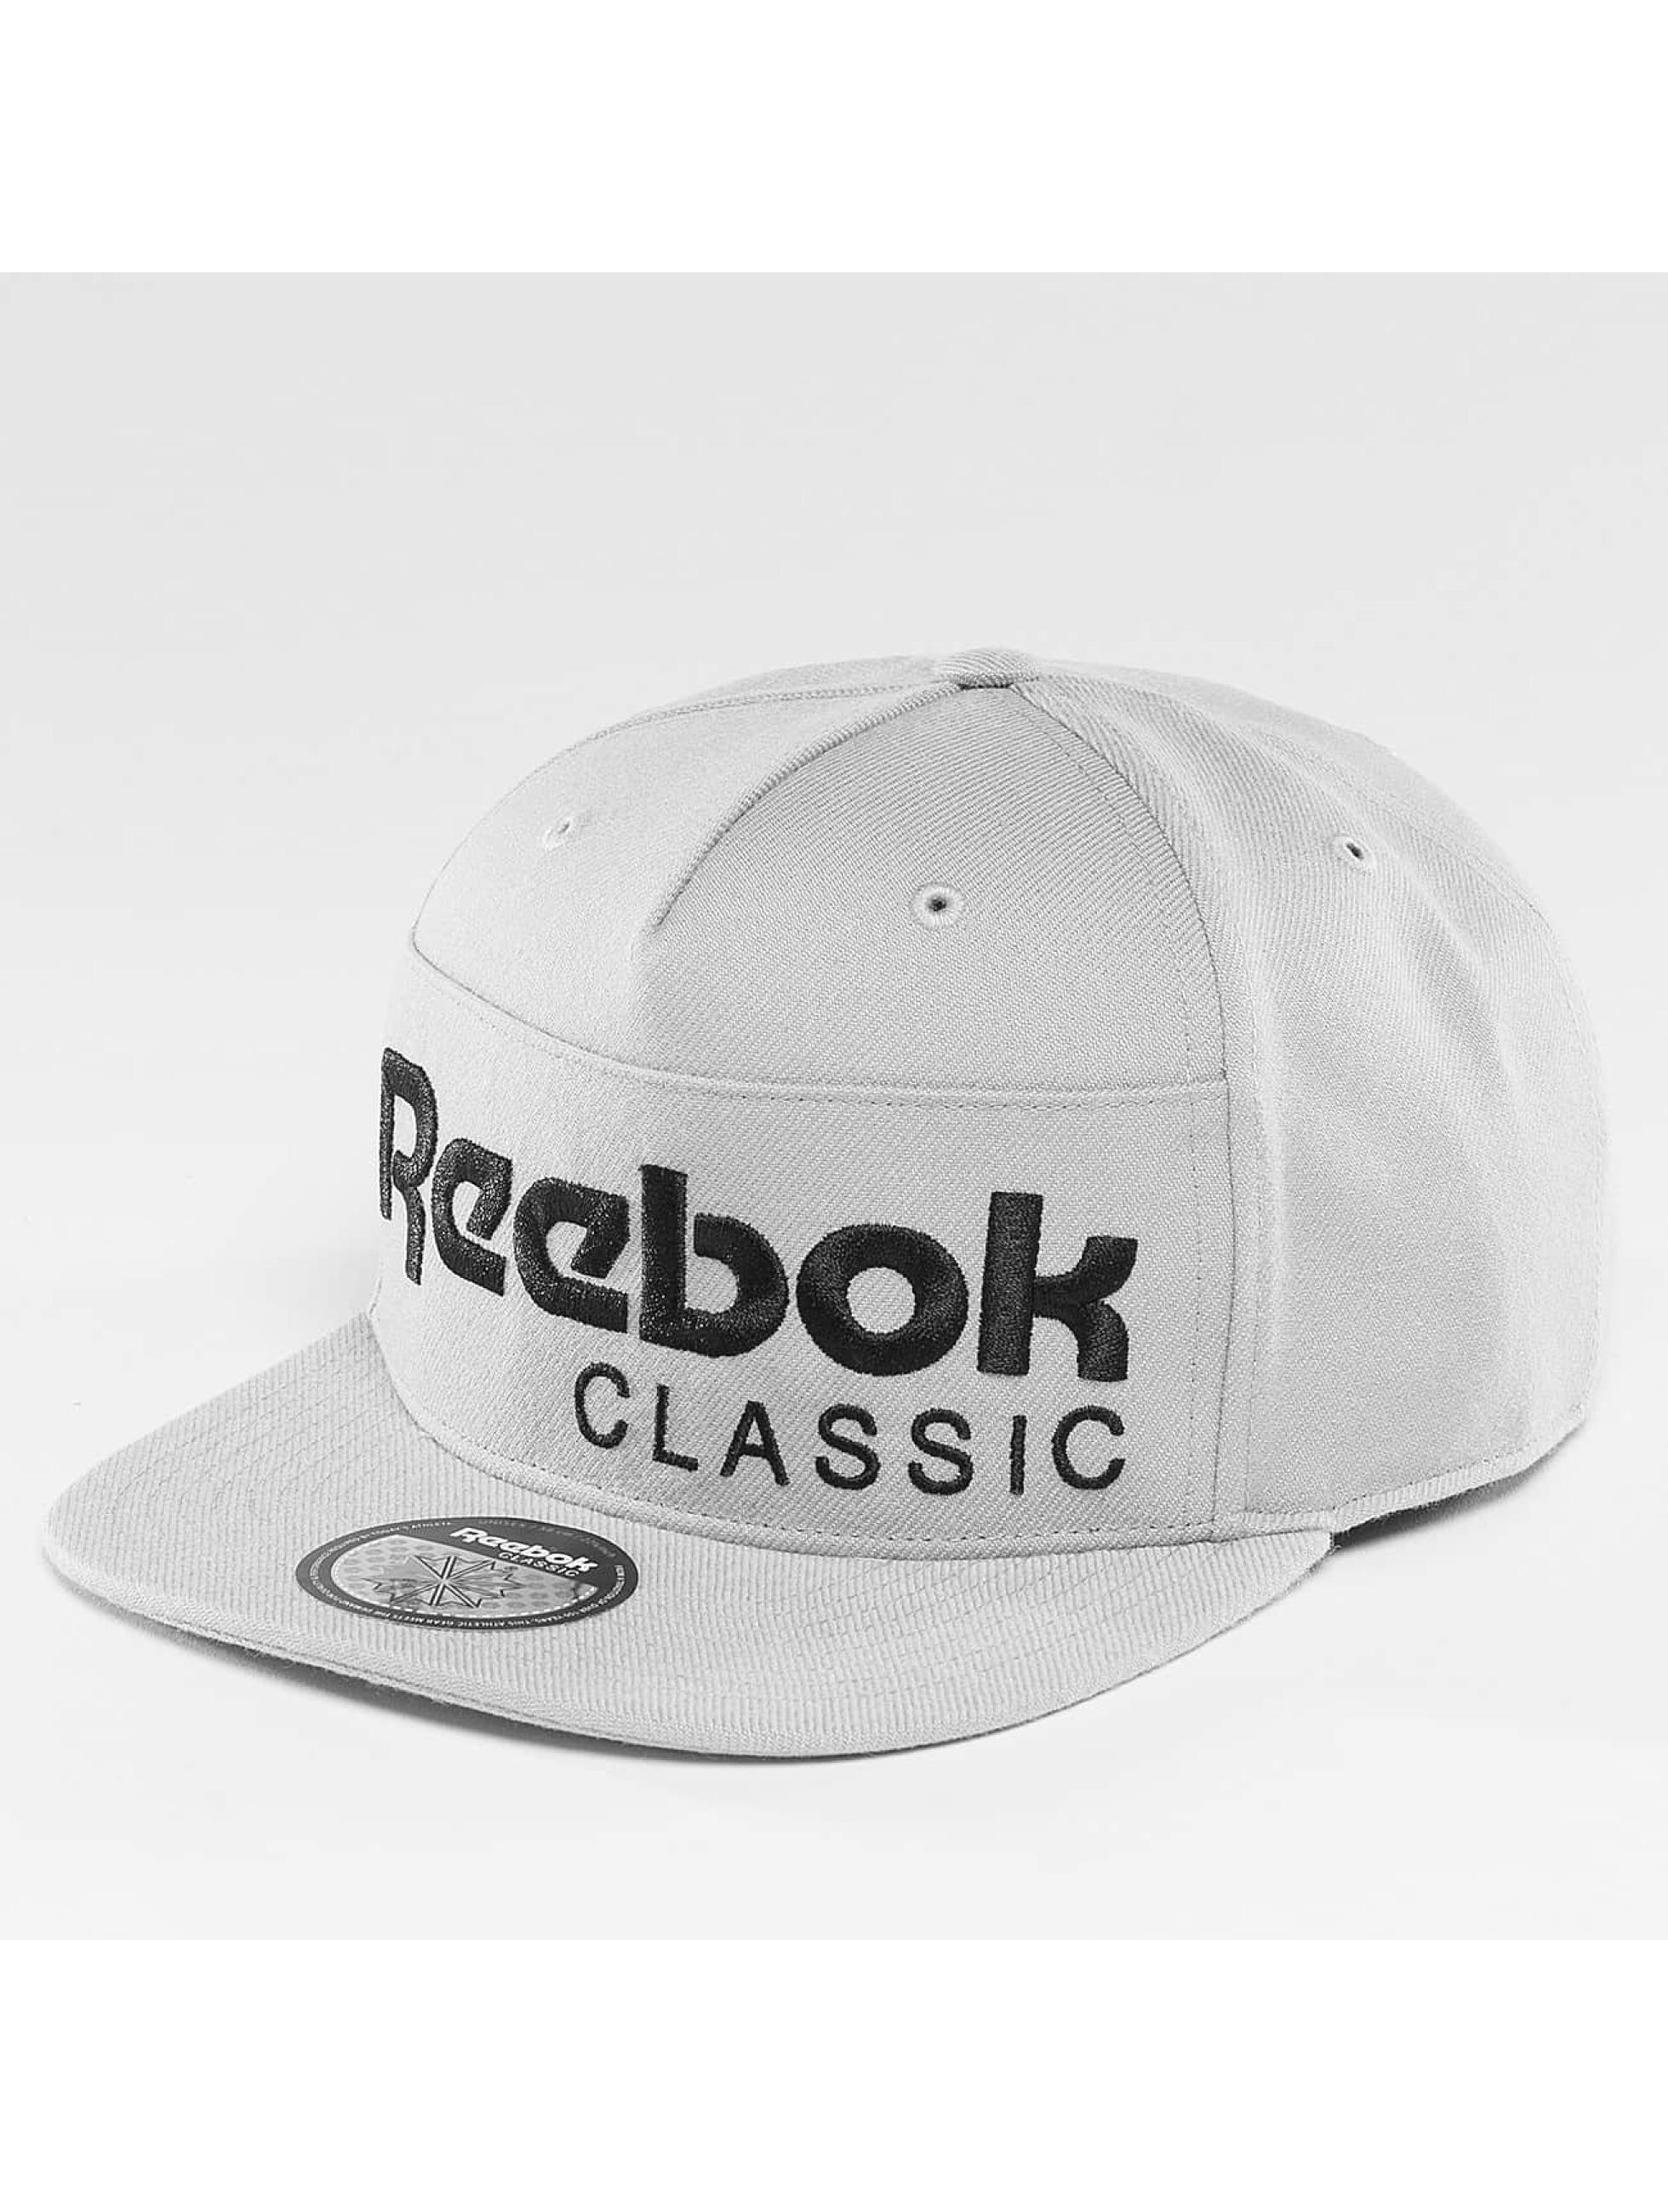 Reebok Männer,Frauen Snapback Cap Foundation in grau